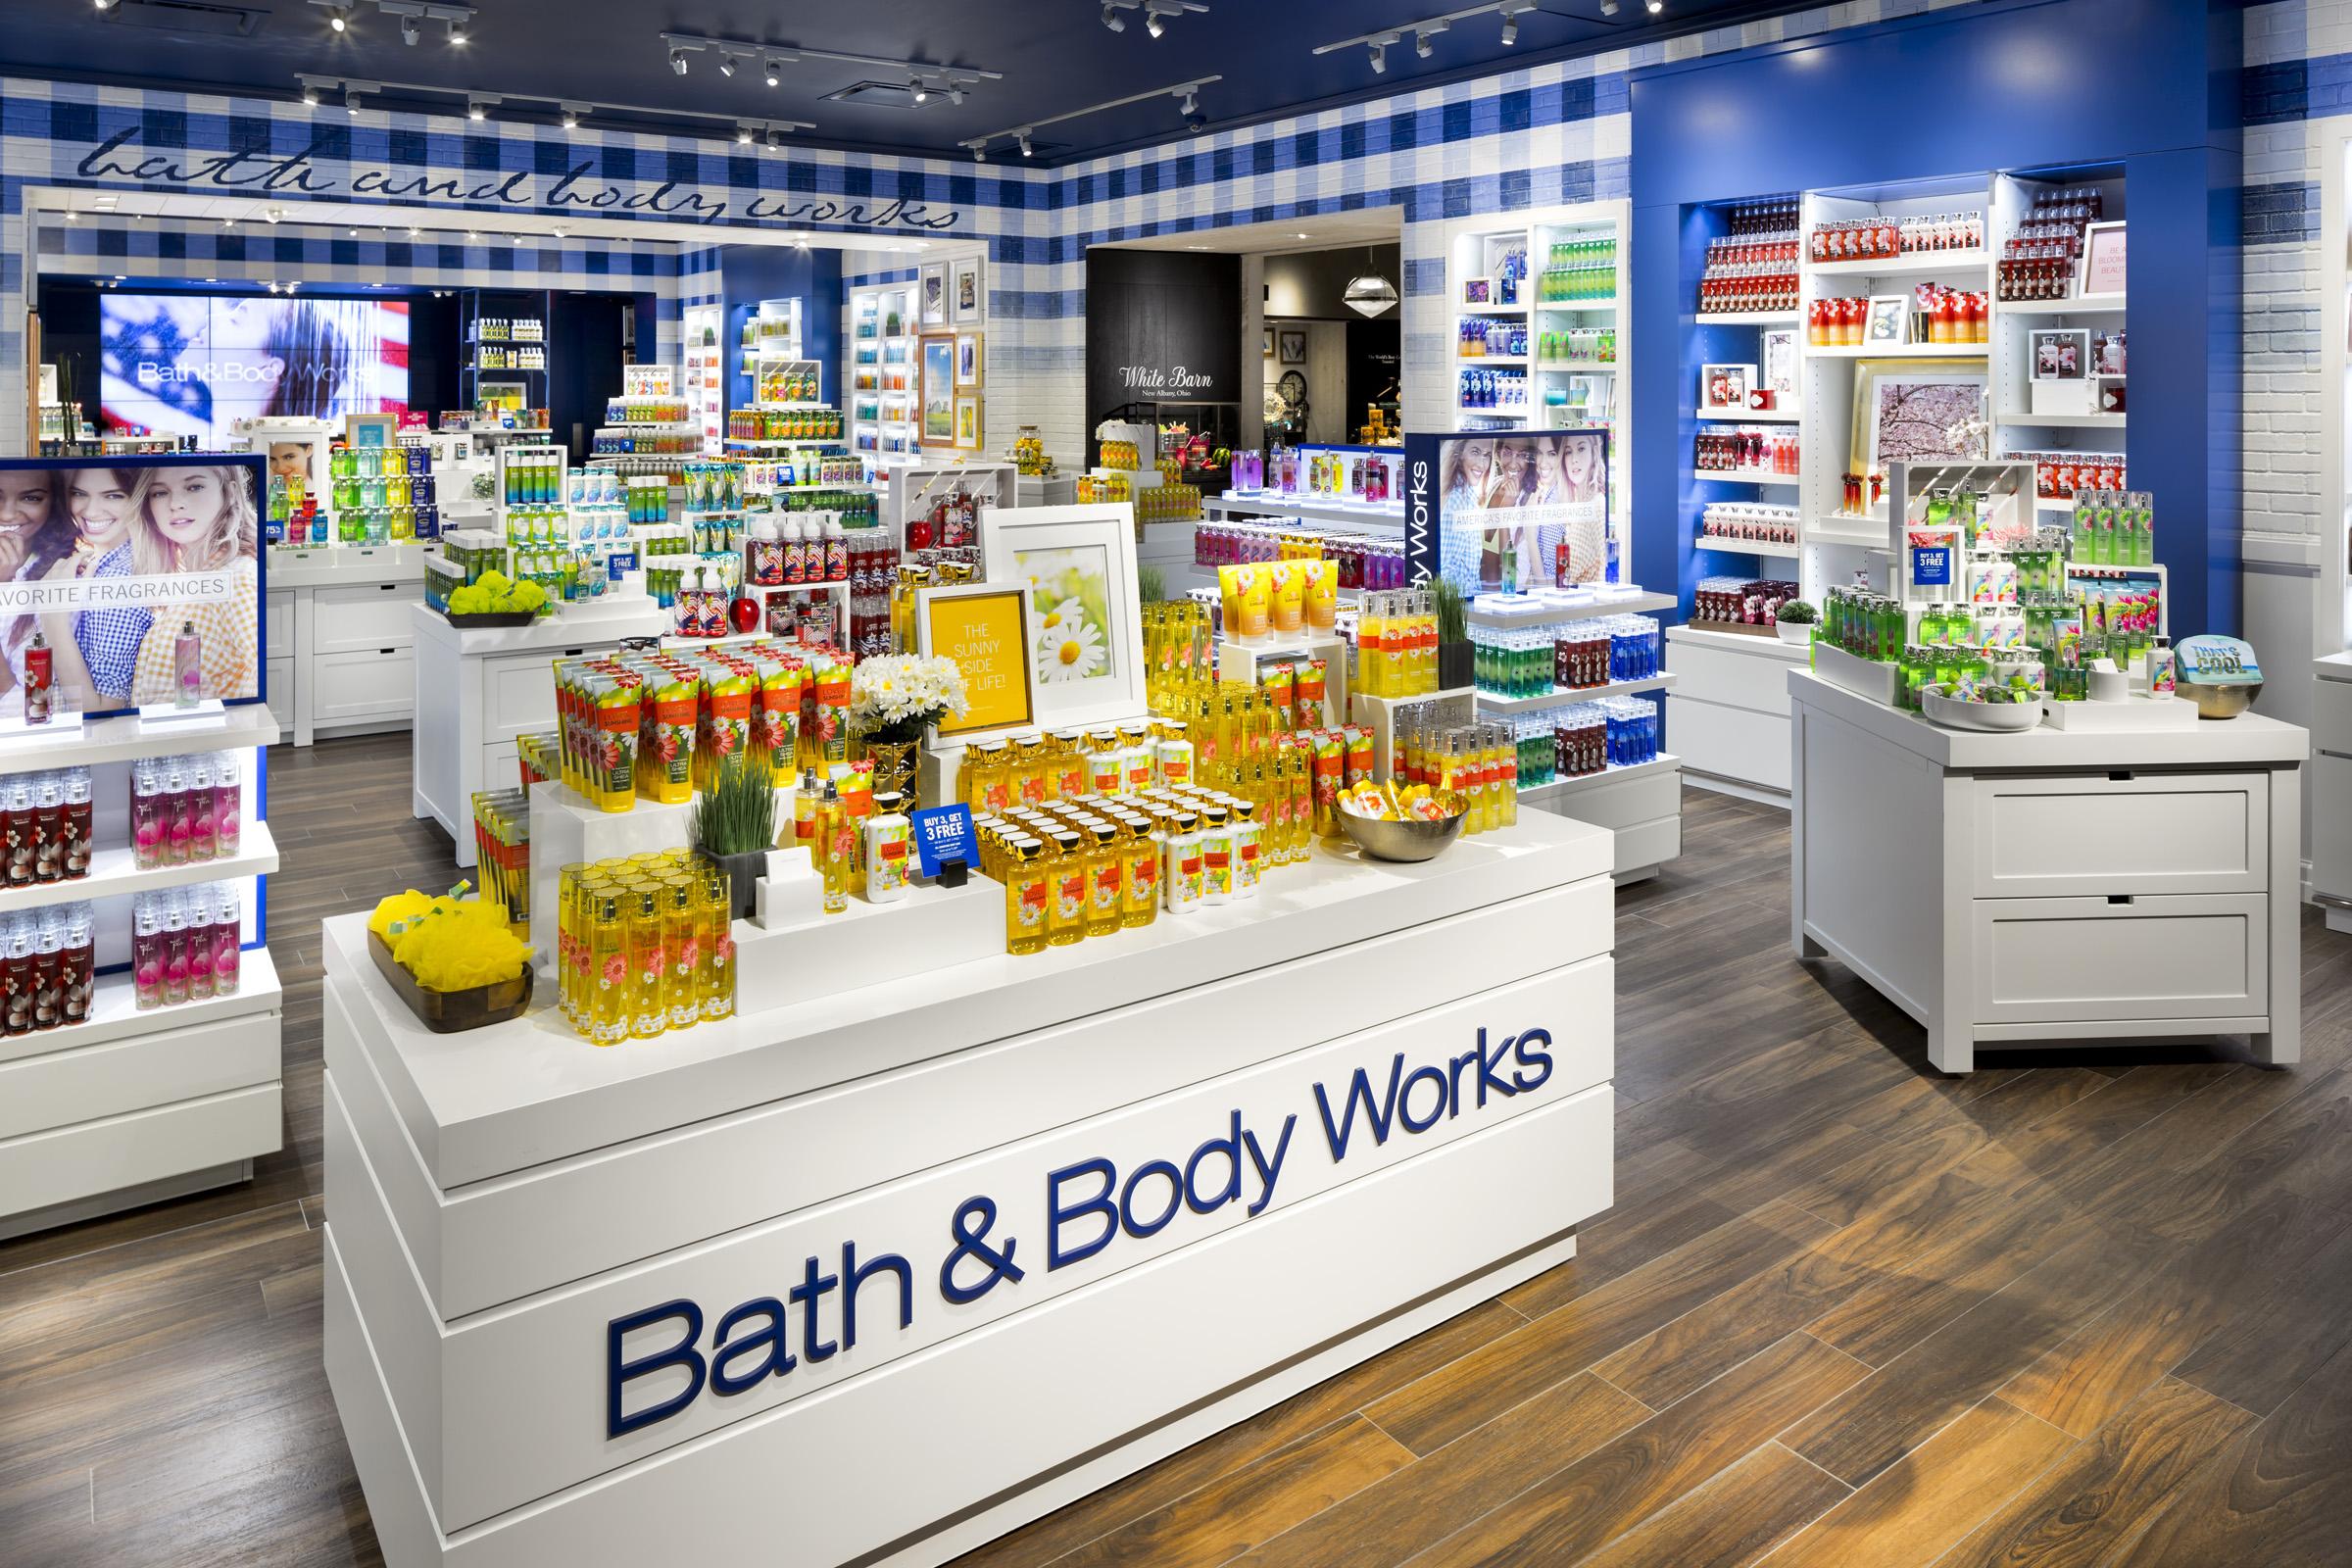 inside a bath & body works store